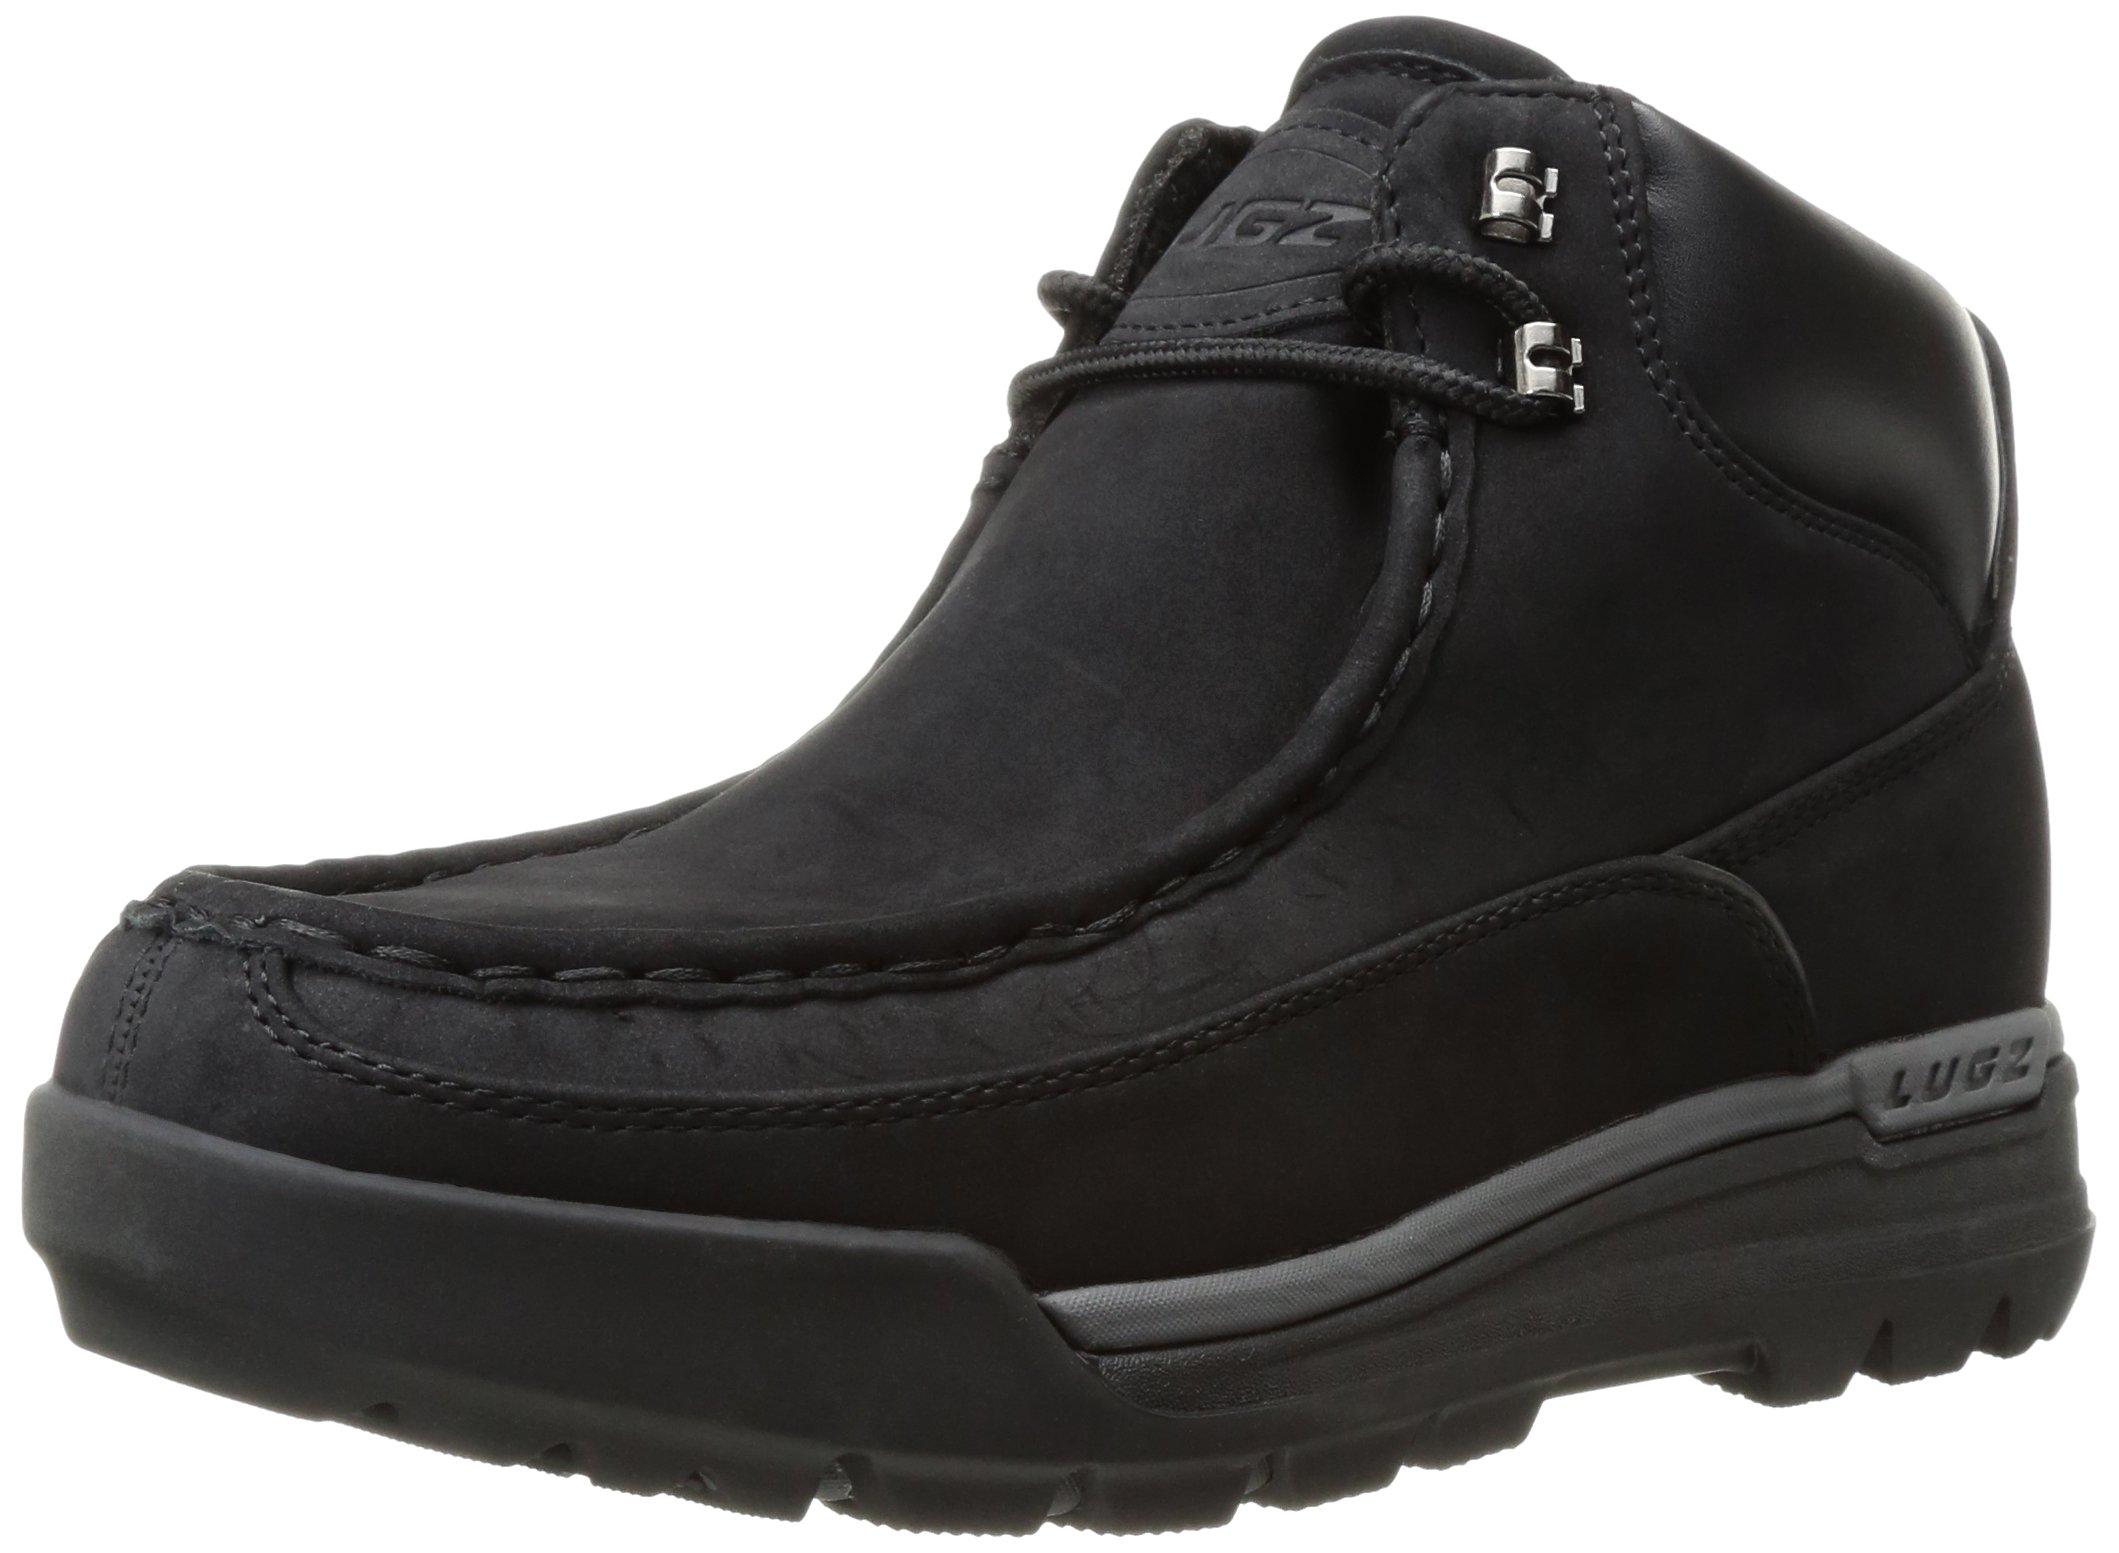 Lugz Men's Breech Chukka Boot, Black/Charcoal, 7 D US